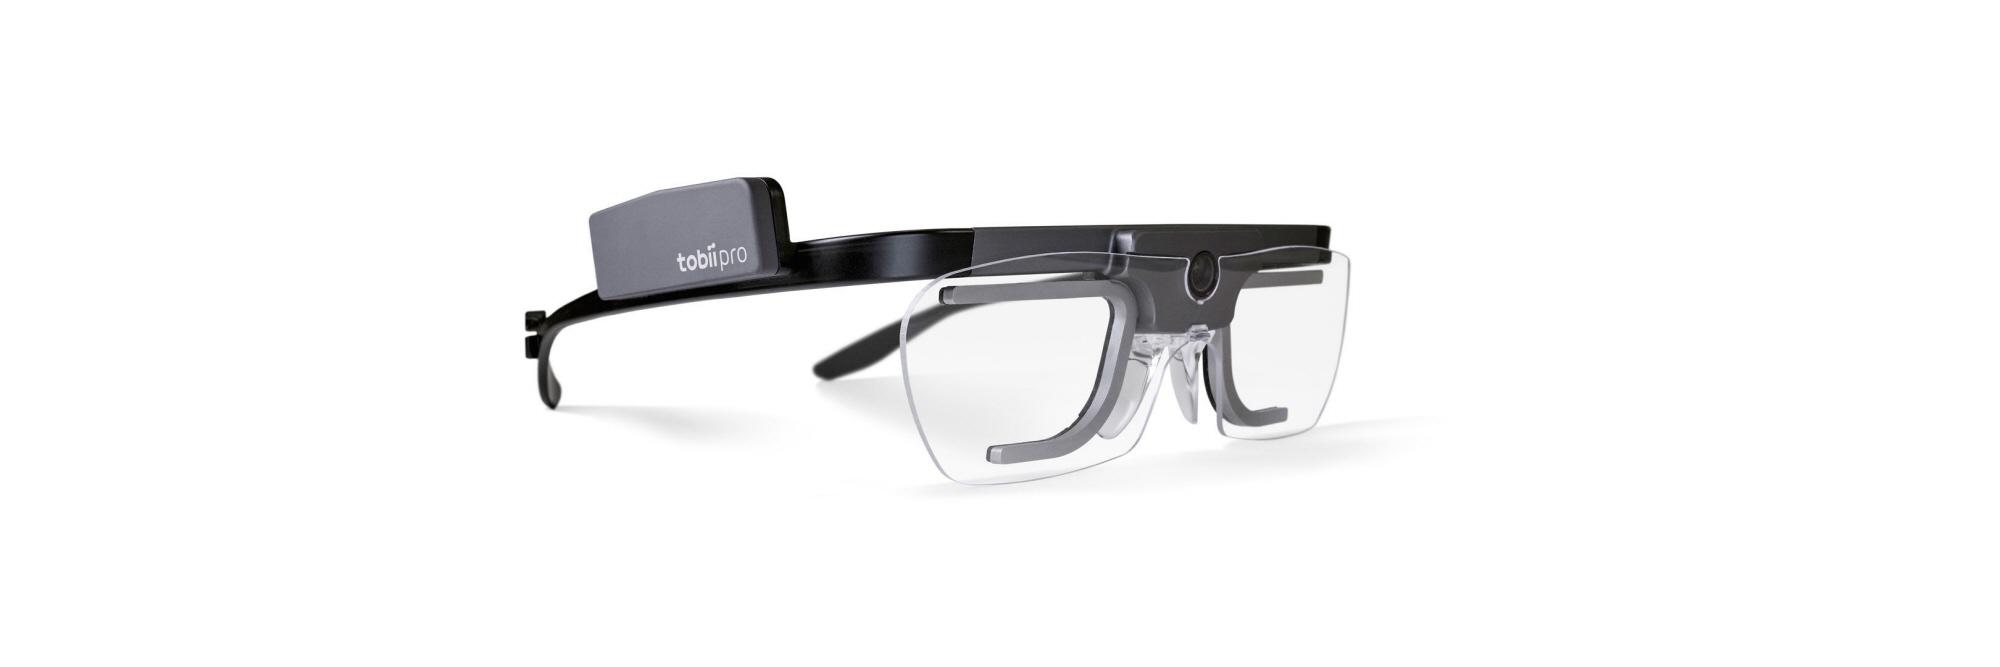 obiiPro Glasses 2 Eye Tracker